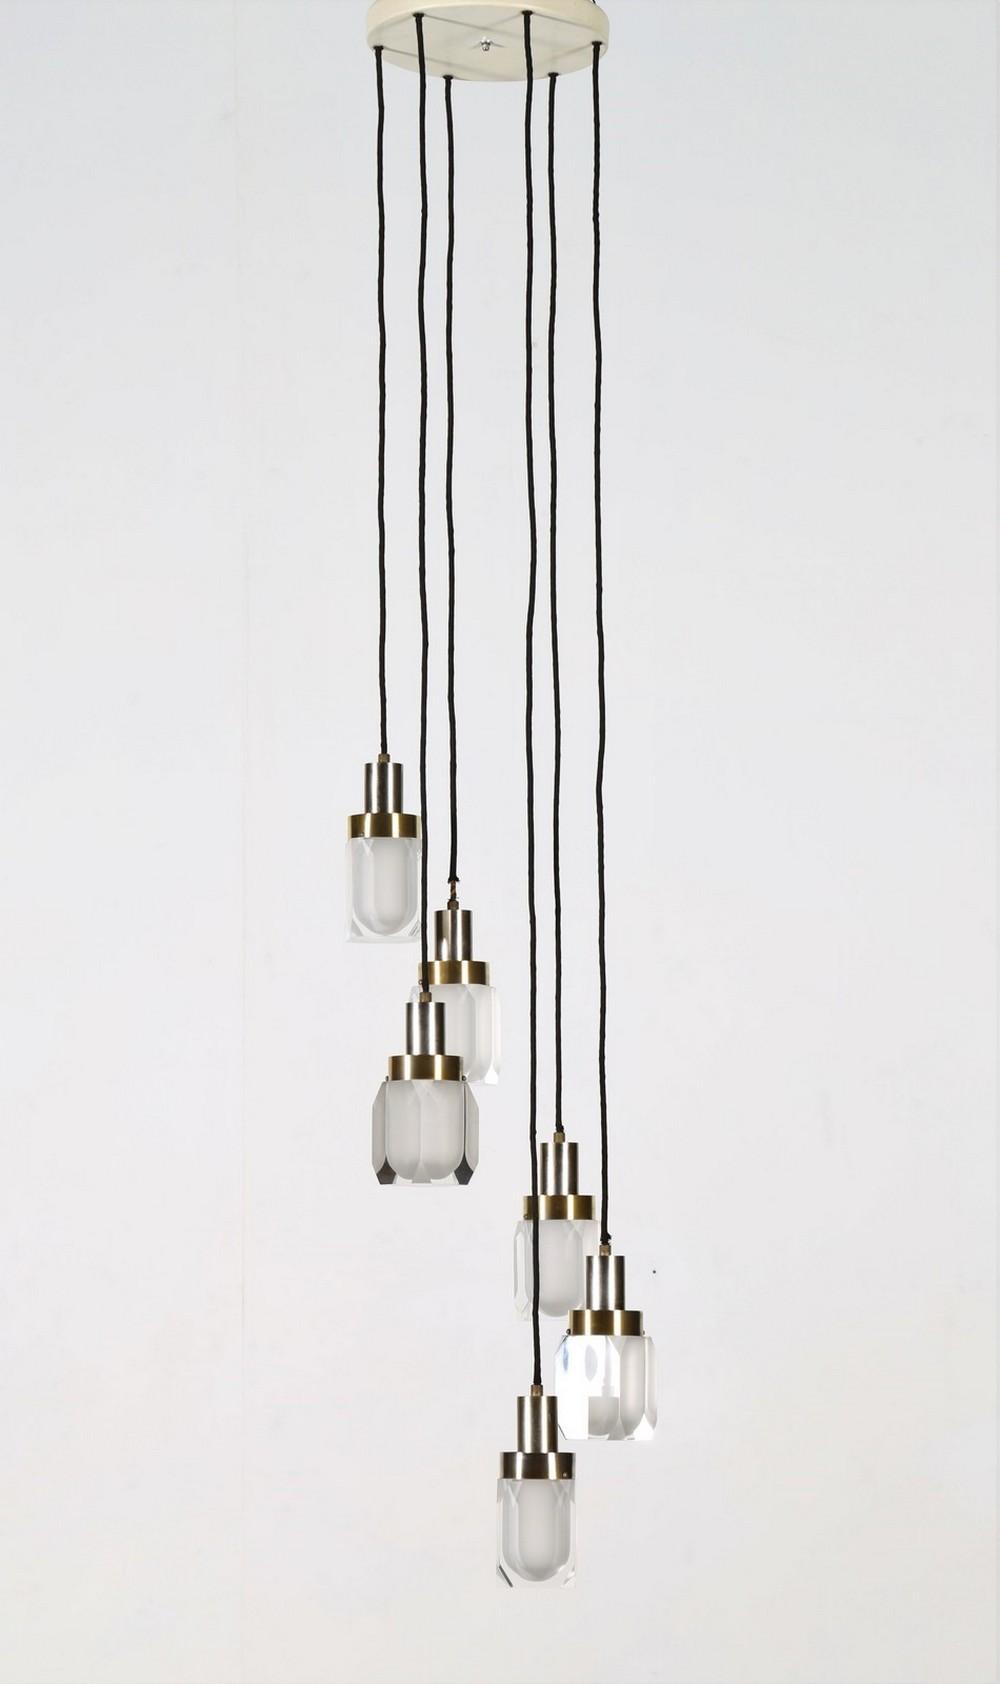 GAETANO MISSAGLIA  Six lights chandelier